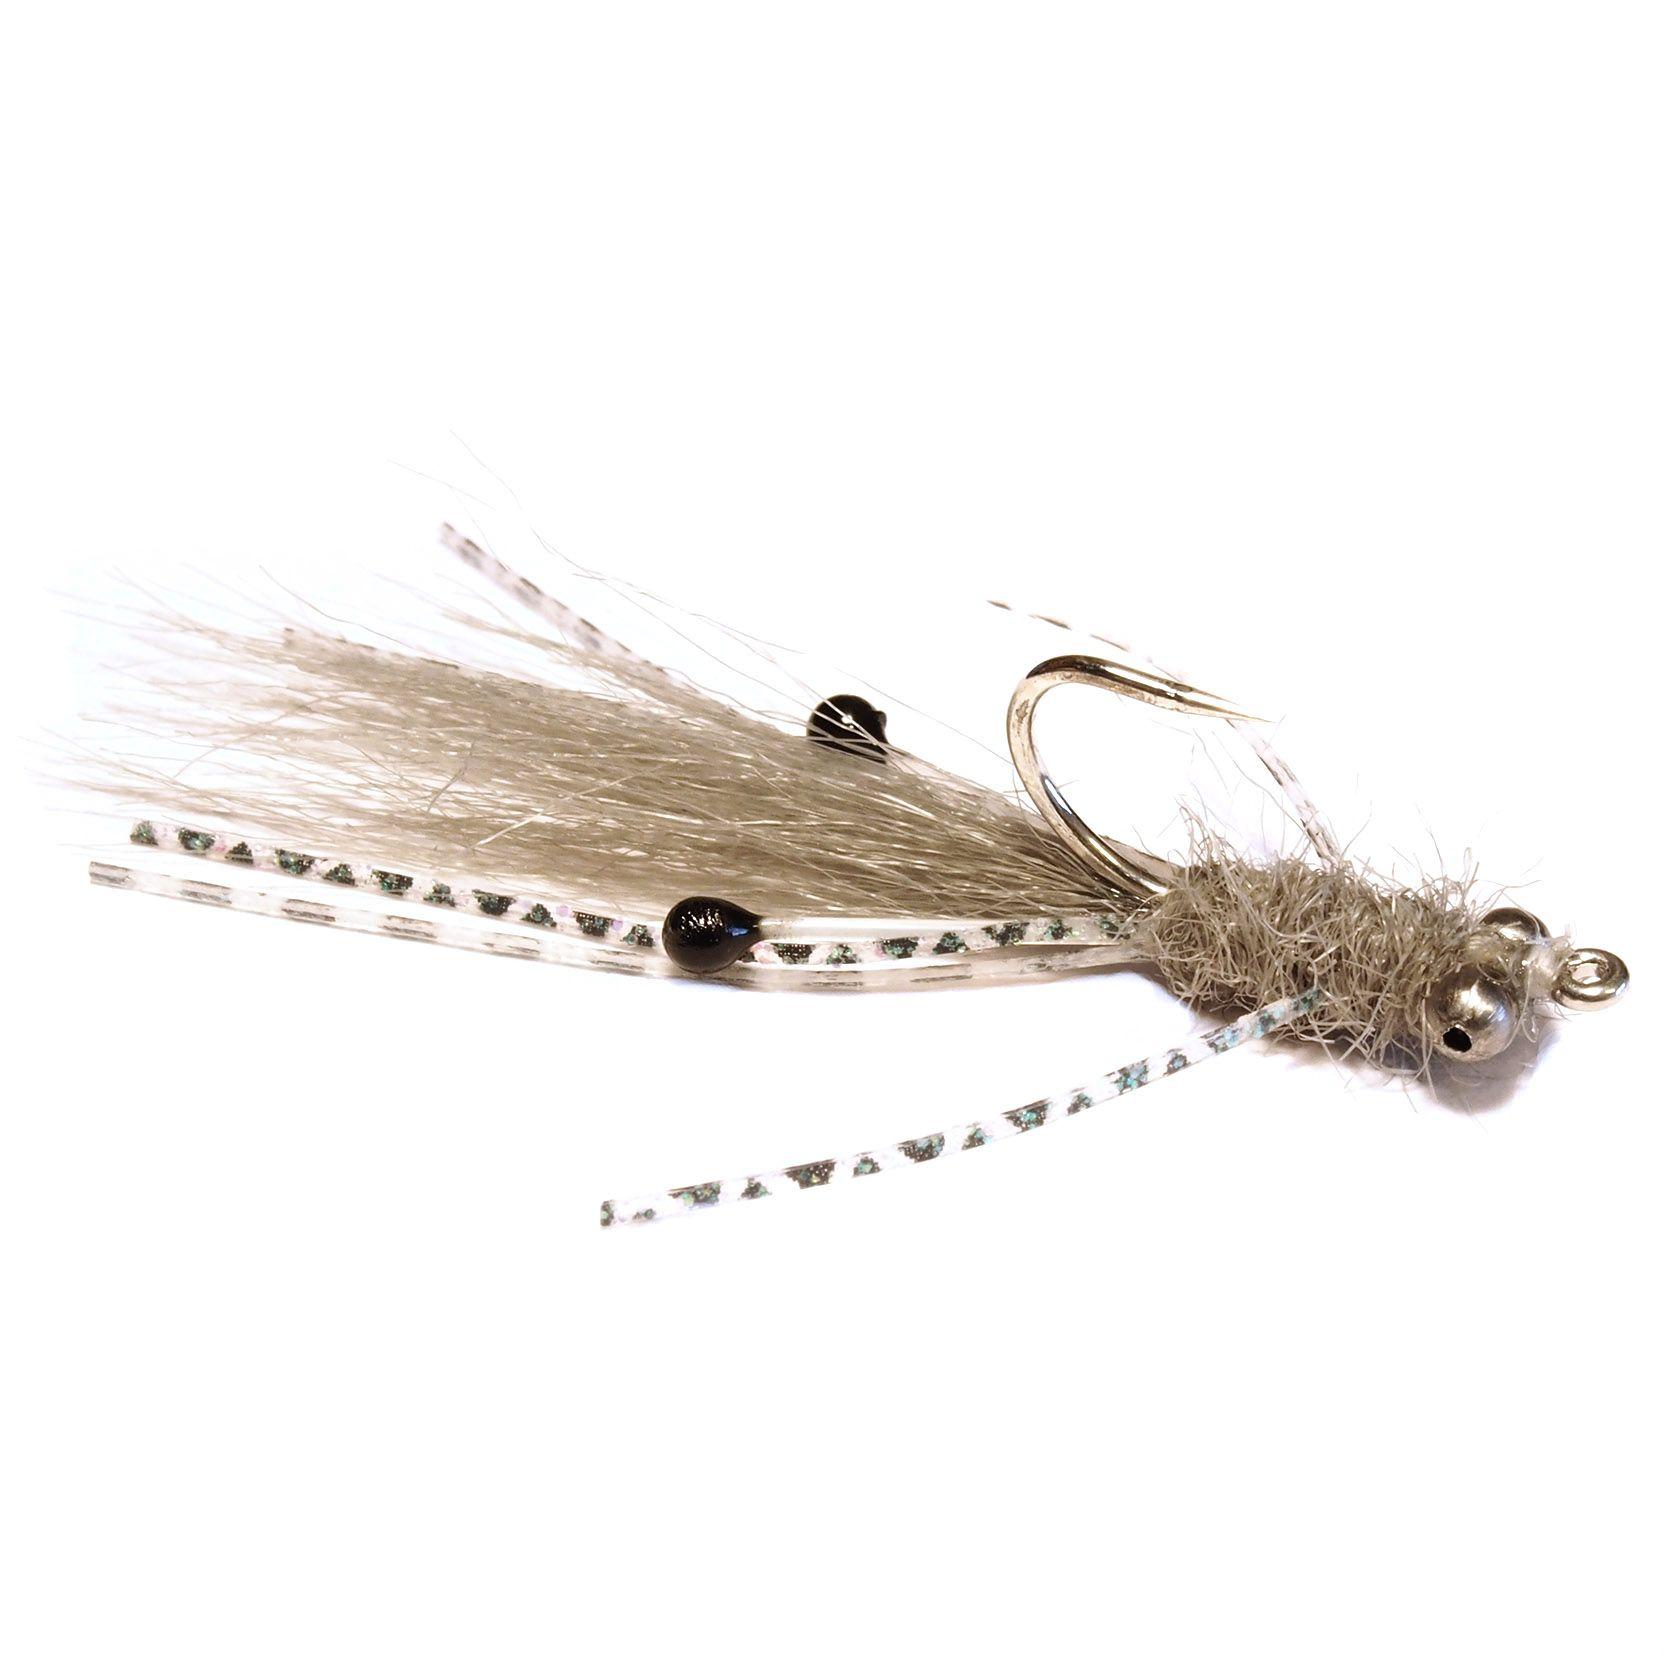 Bob Veverka's Mantis Shrimp